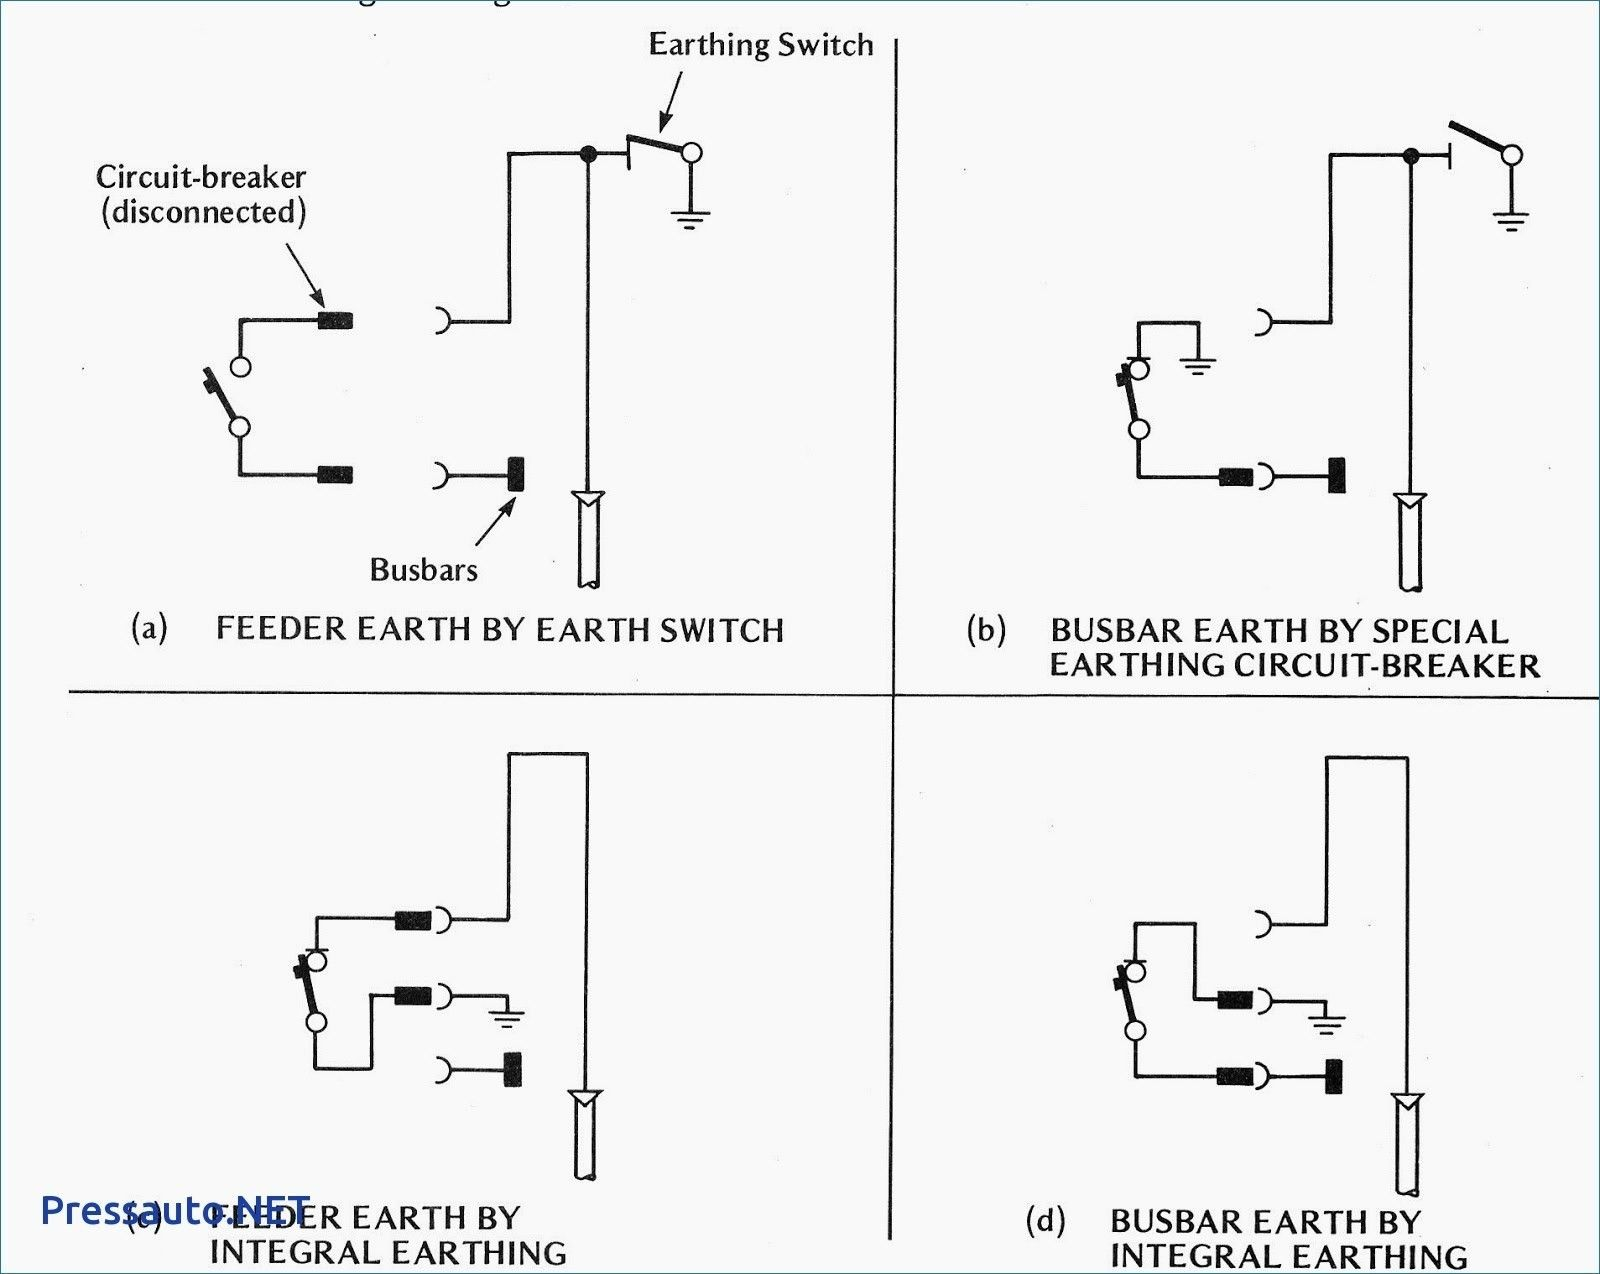 hight resolution of  diagram diagramsample diagramtemplate wiringdiagram diagramchart worksheet worksheettemplate